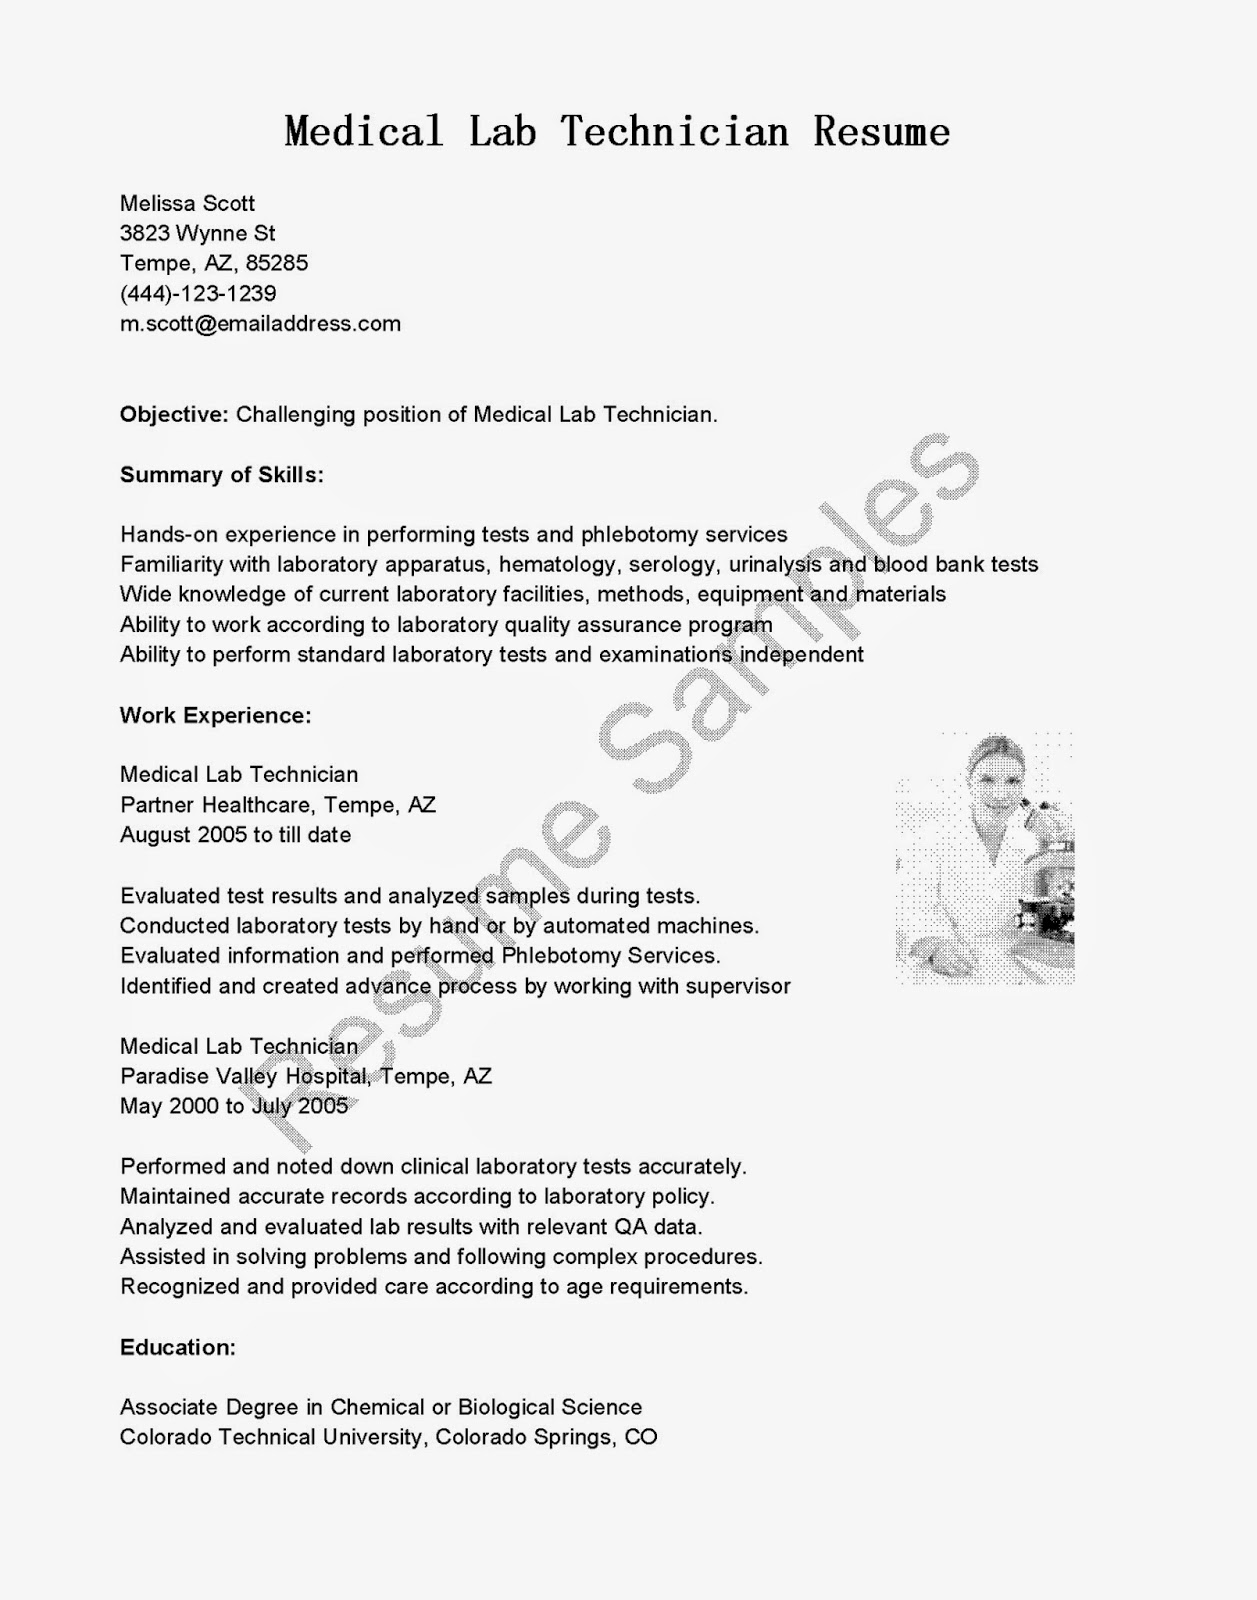 Dental Lab Technician Resume Acworldcup Tk Carpinteria Rural Friedrich  Medical Lab Technician Resume